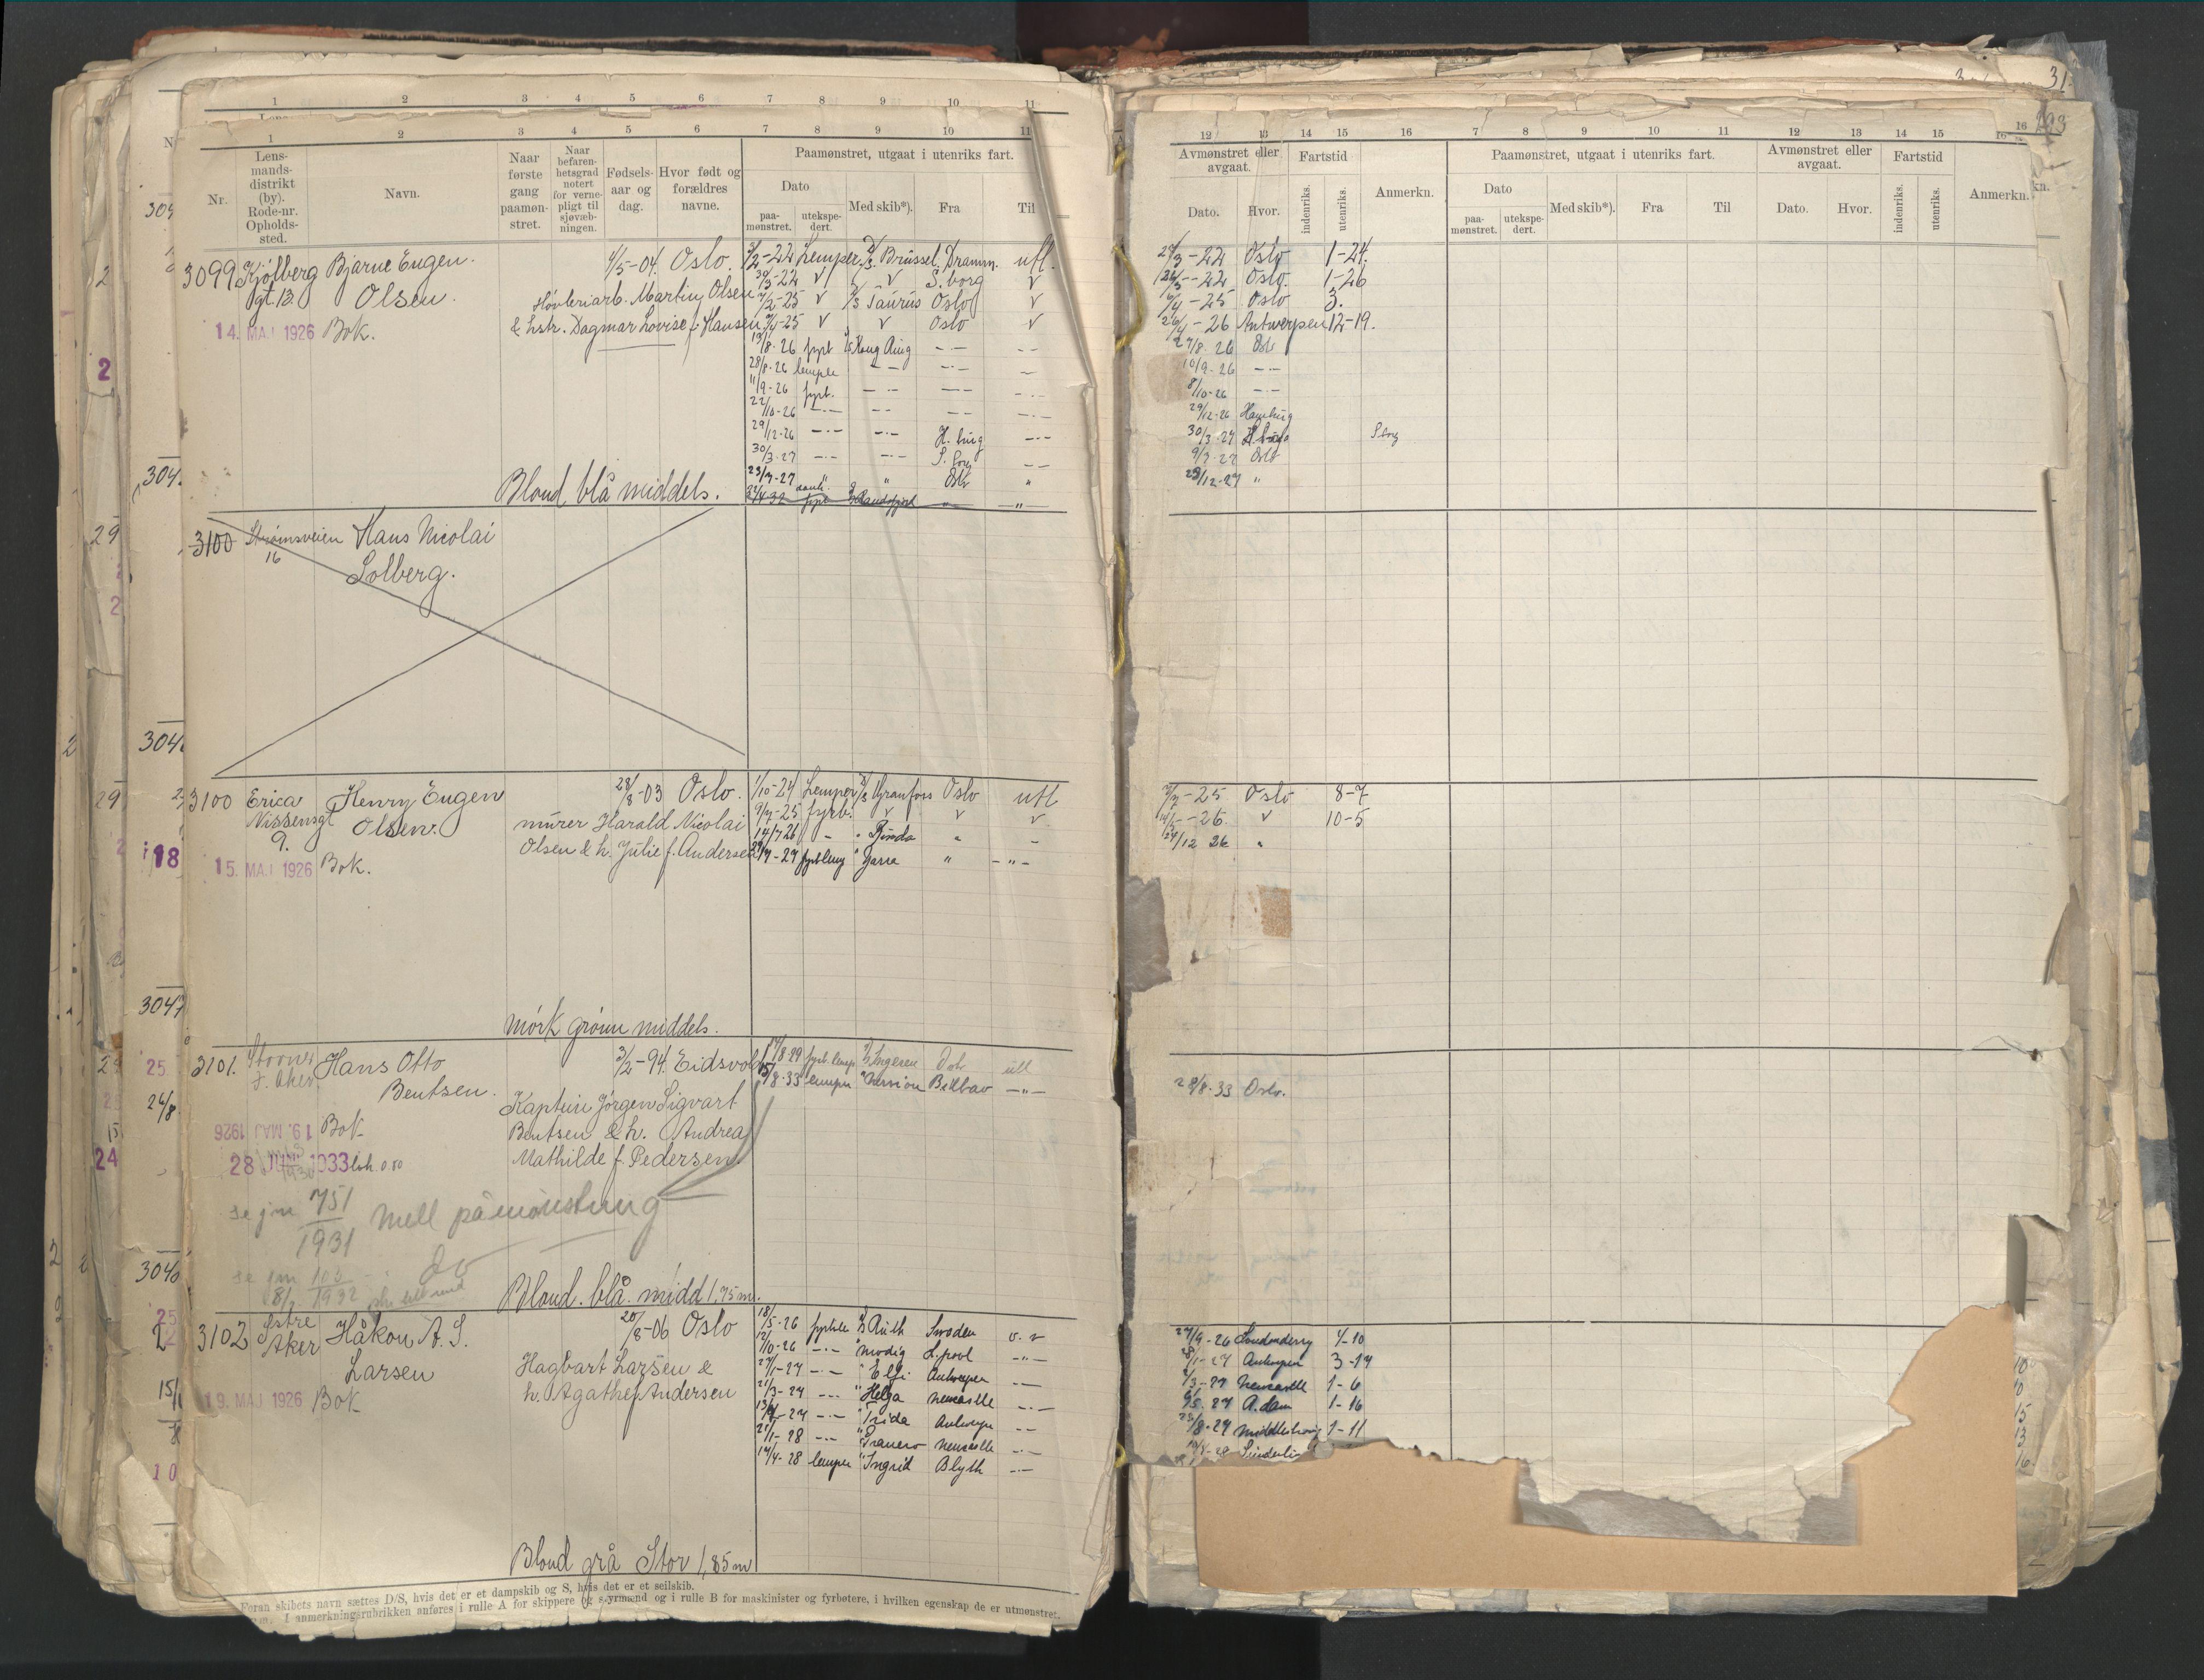 SAO, Oslo sjømannskontor, F/Fd/L0003: B-rulle, 1916, s. 291b-292a